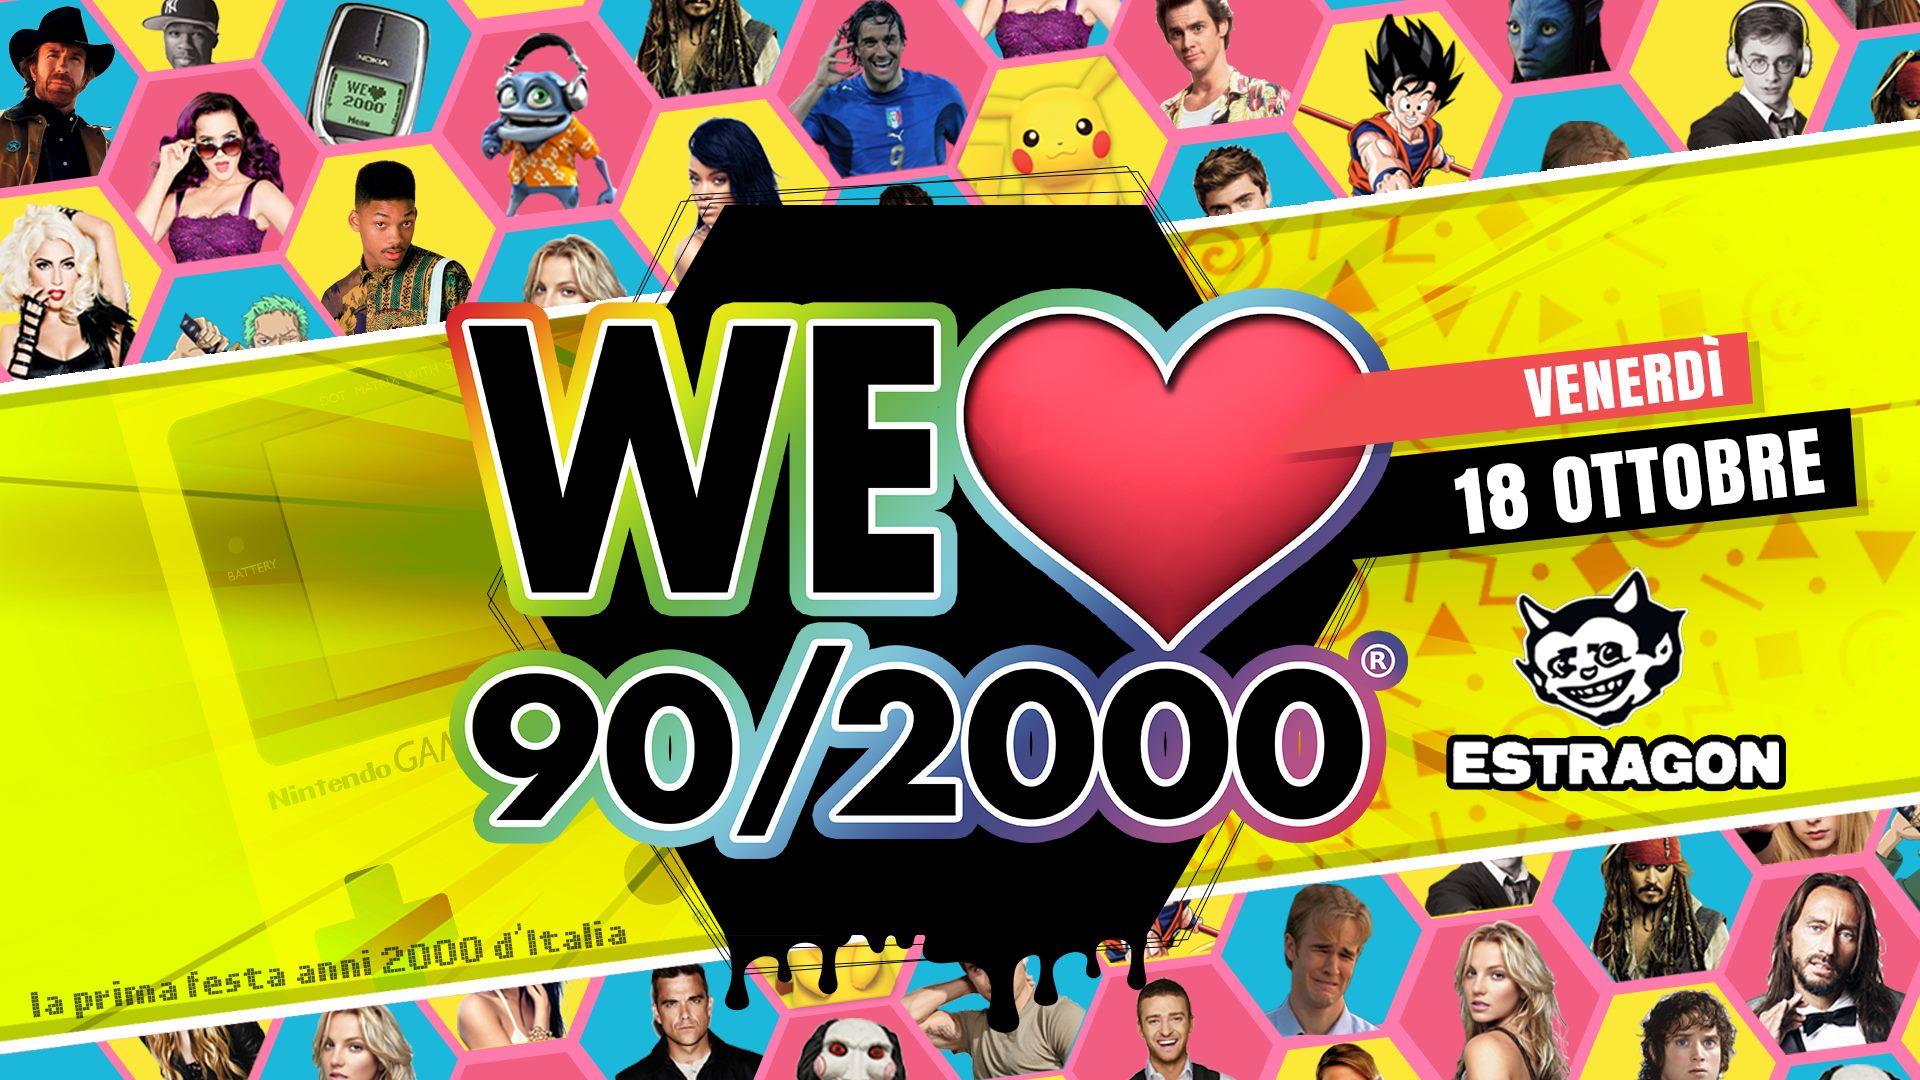 WE Love 90/2000 - Opening!